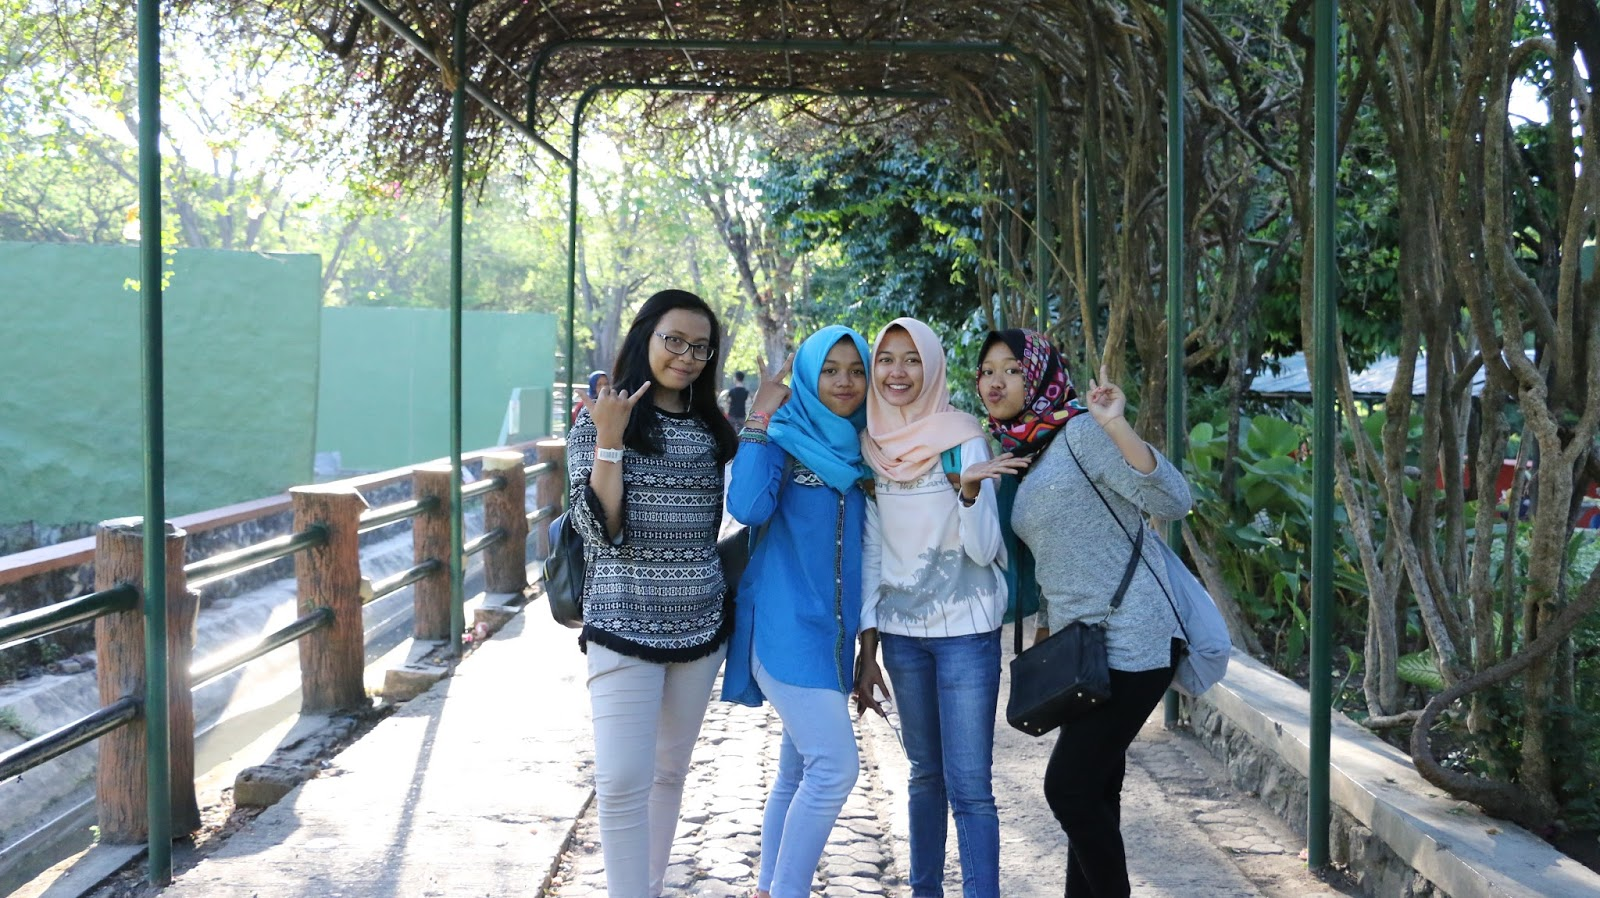 Tempat Wisata Di Wonokromo Surabaya